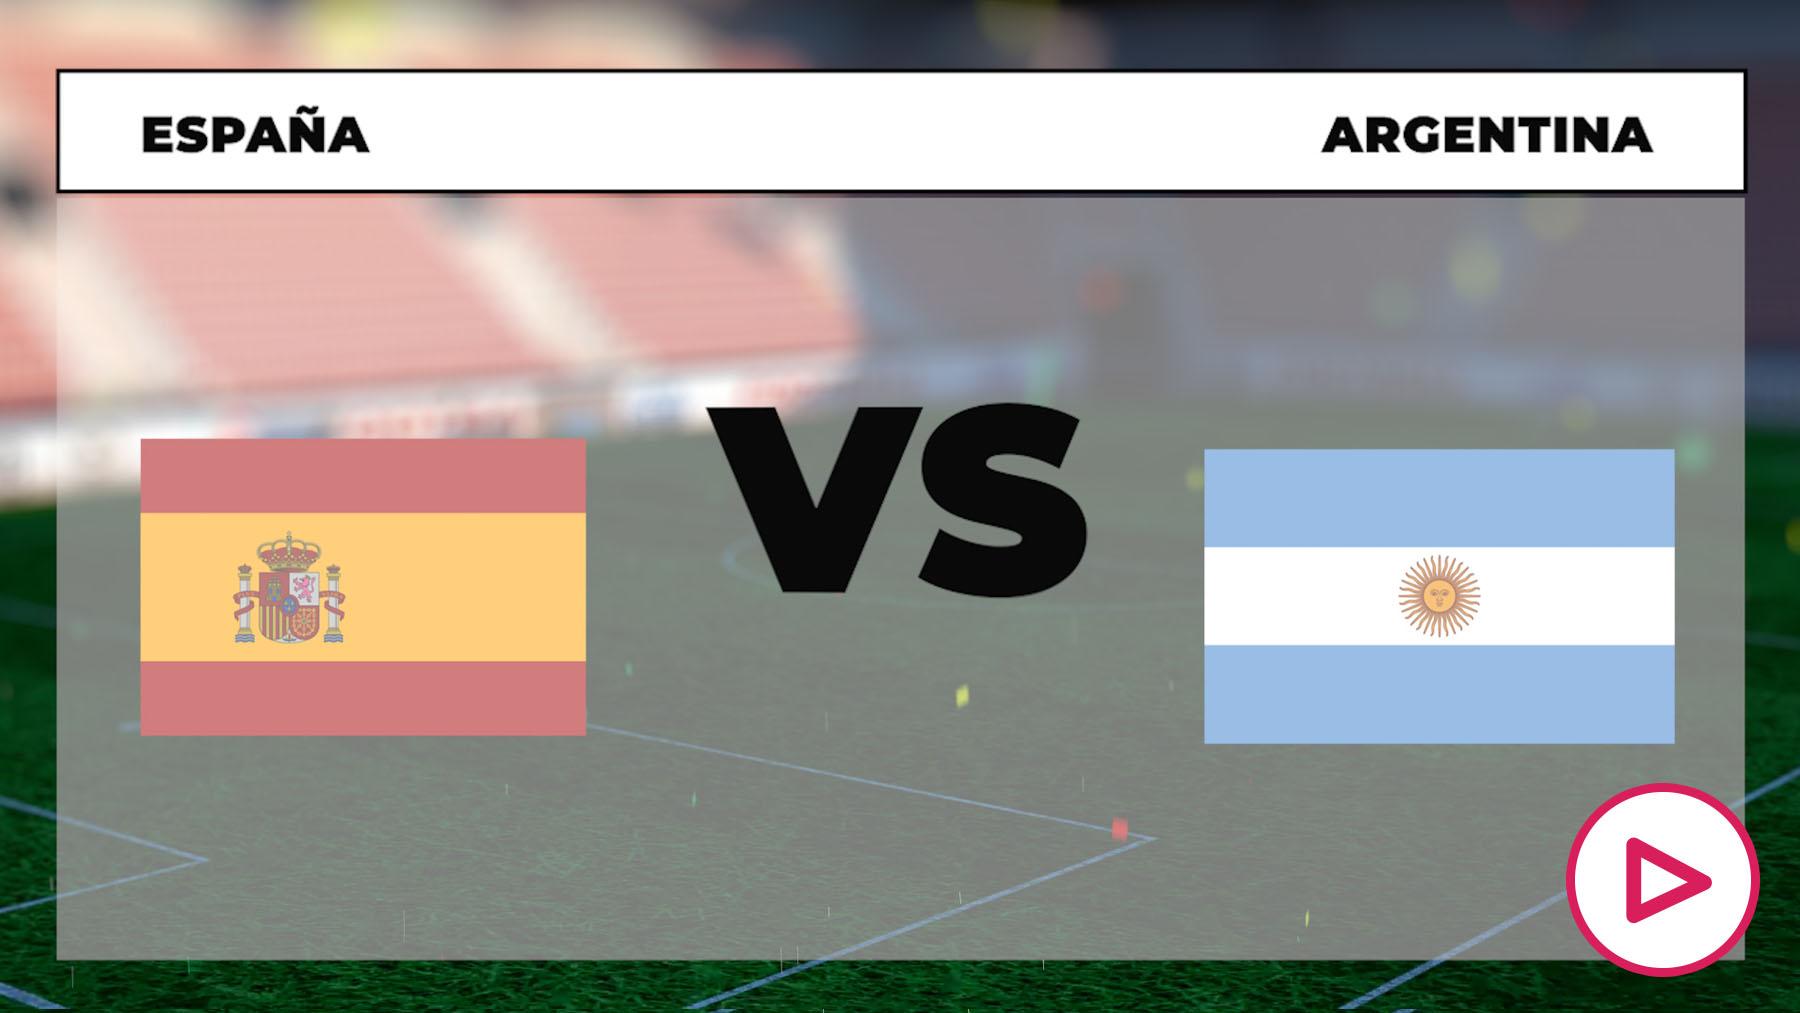 Juegos Olímpicos 2020: España – Argentina | Horario del partido de baloncesto de los Juegos Olímpicos 2020.